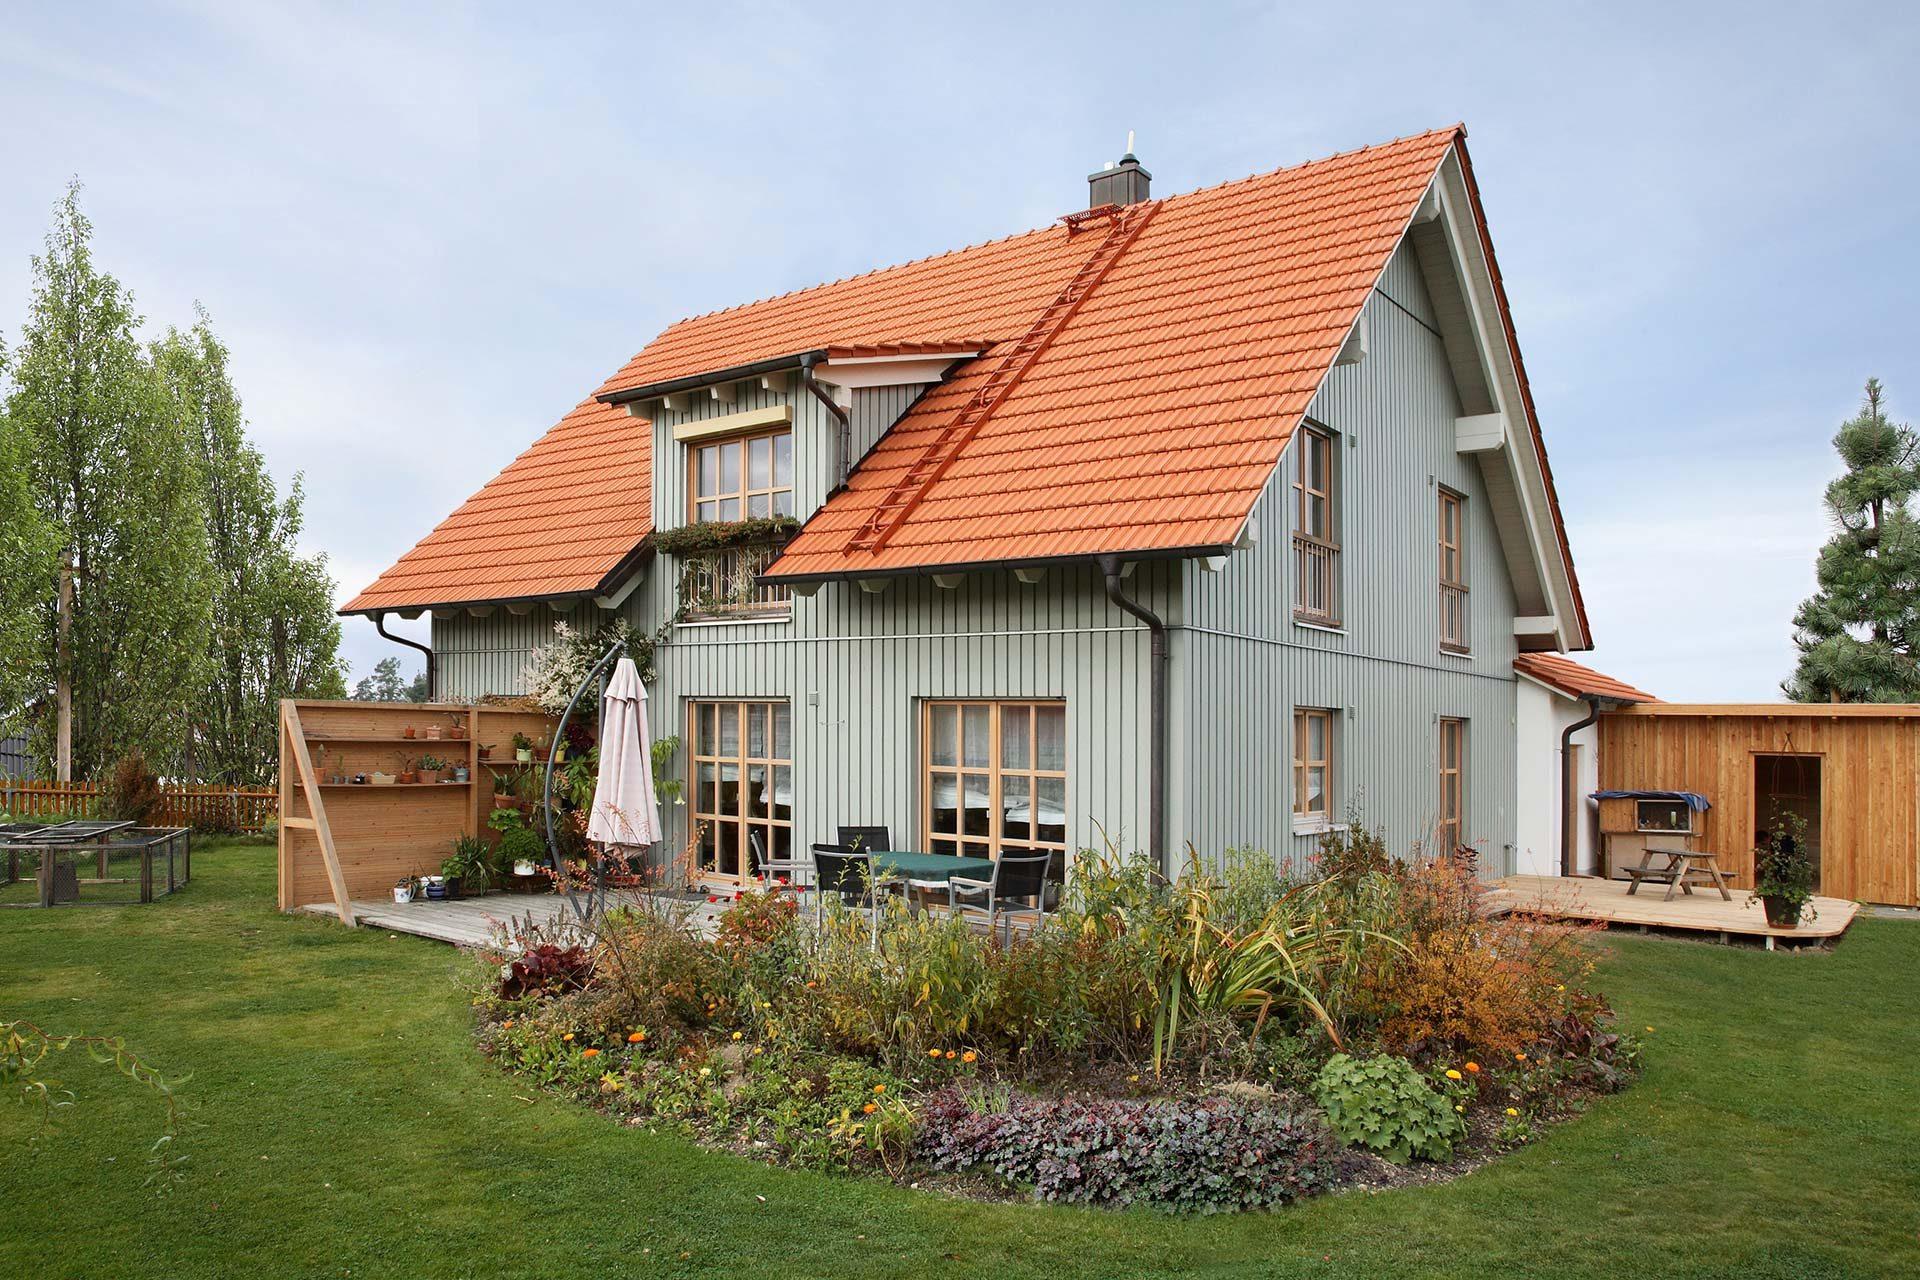 Rustikales Haus in Holzrahmenbauweise